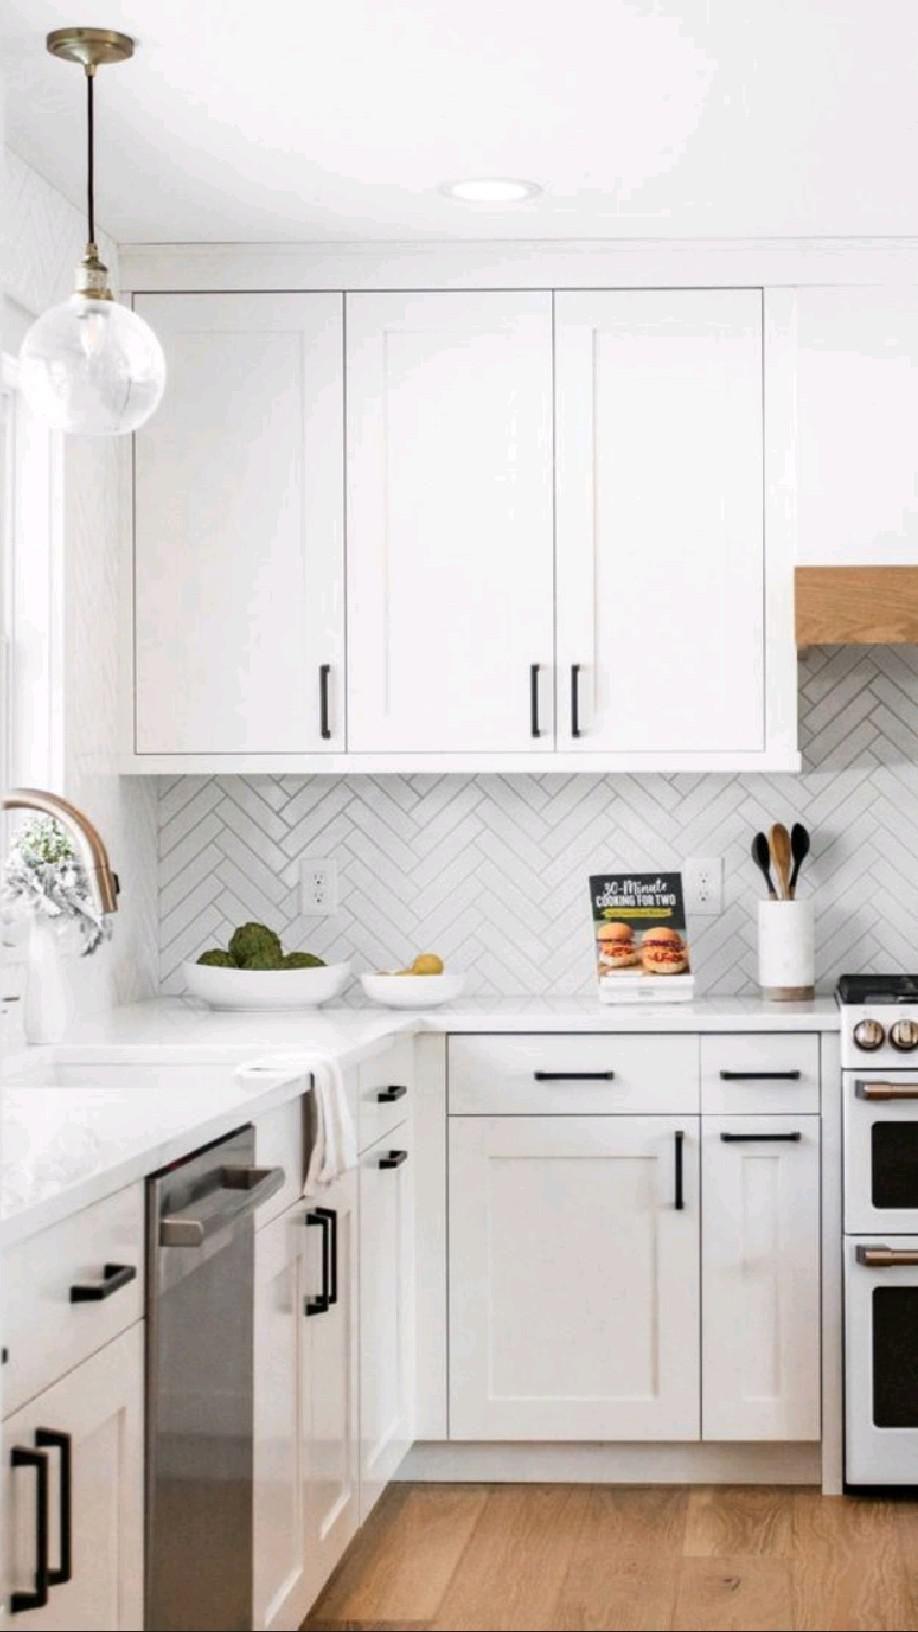 White kitchen ideas   kitchendesign  kitchenstyle  interiordesign